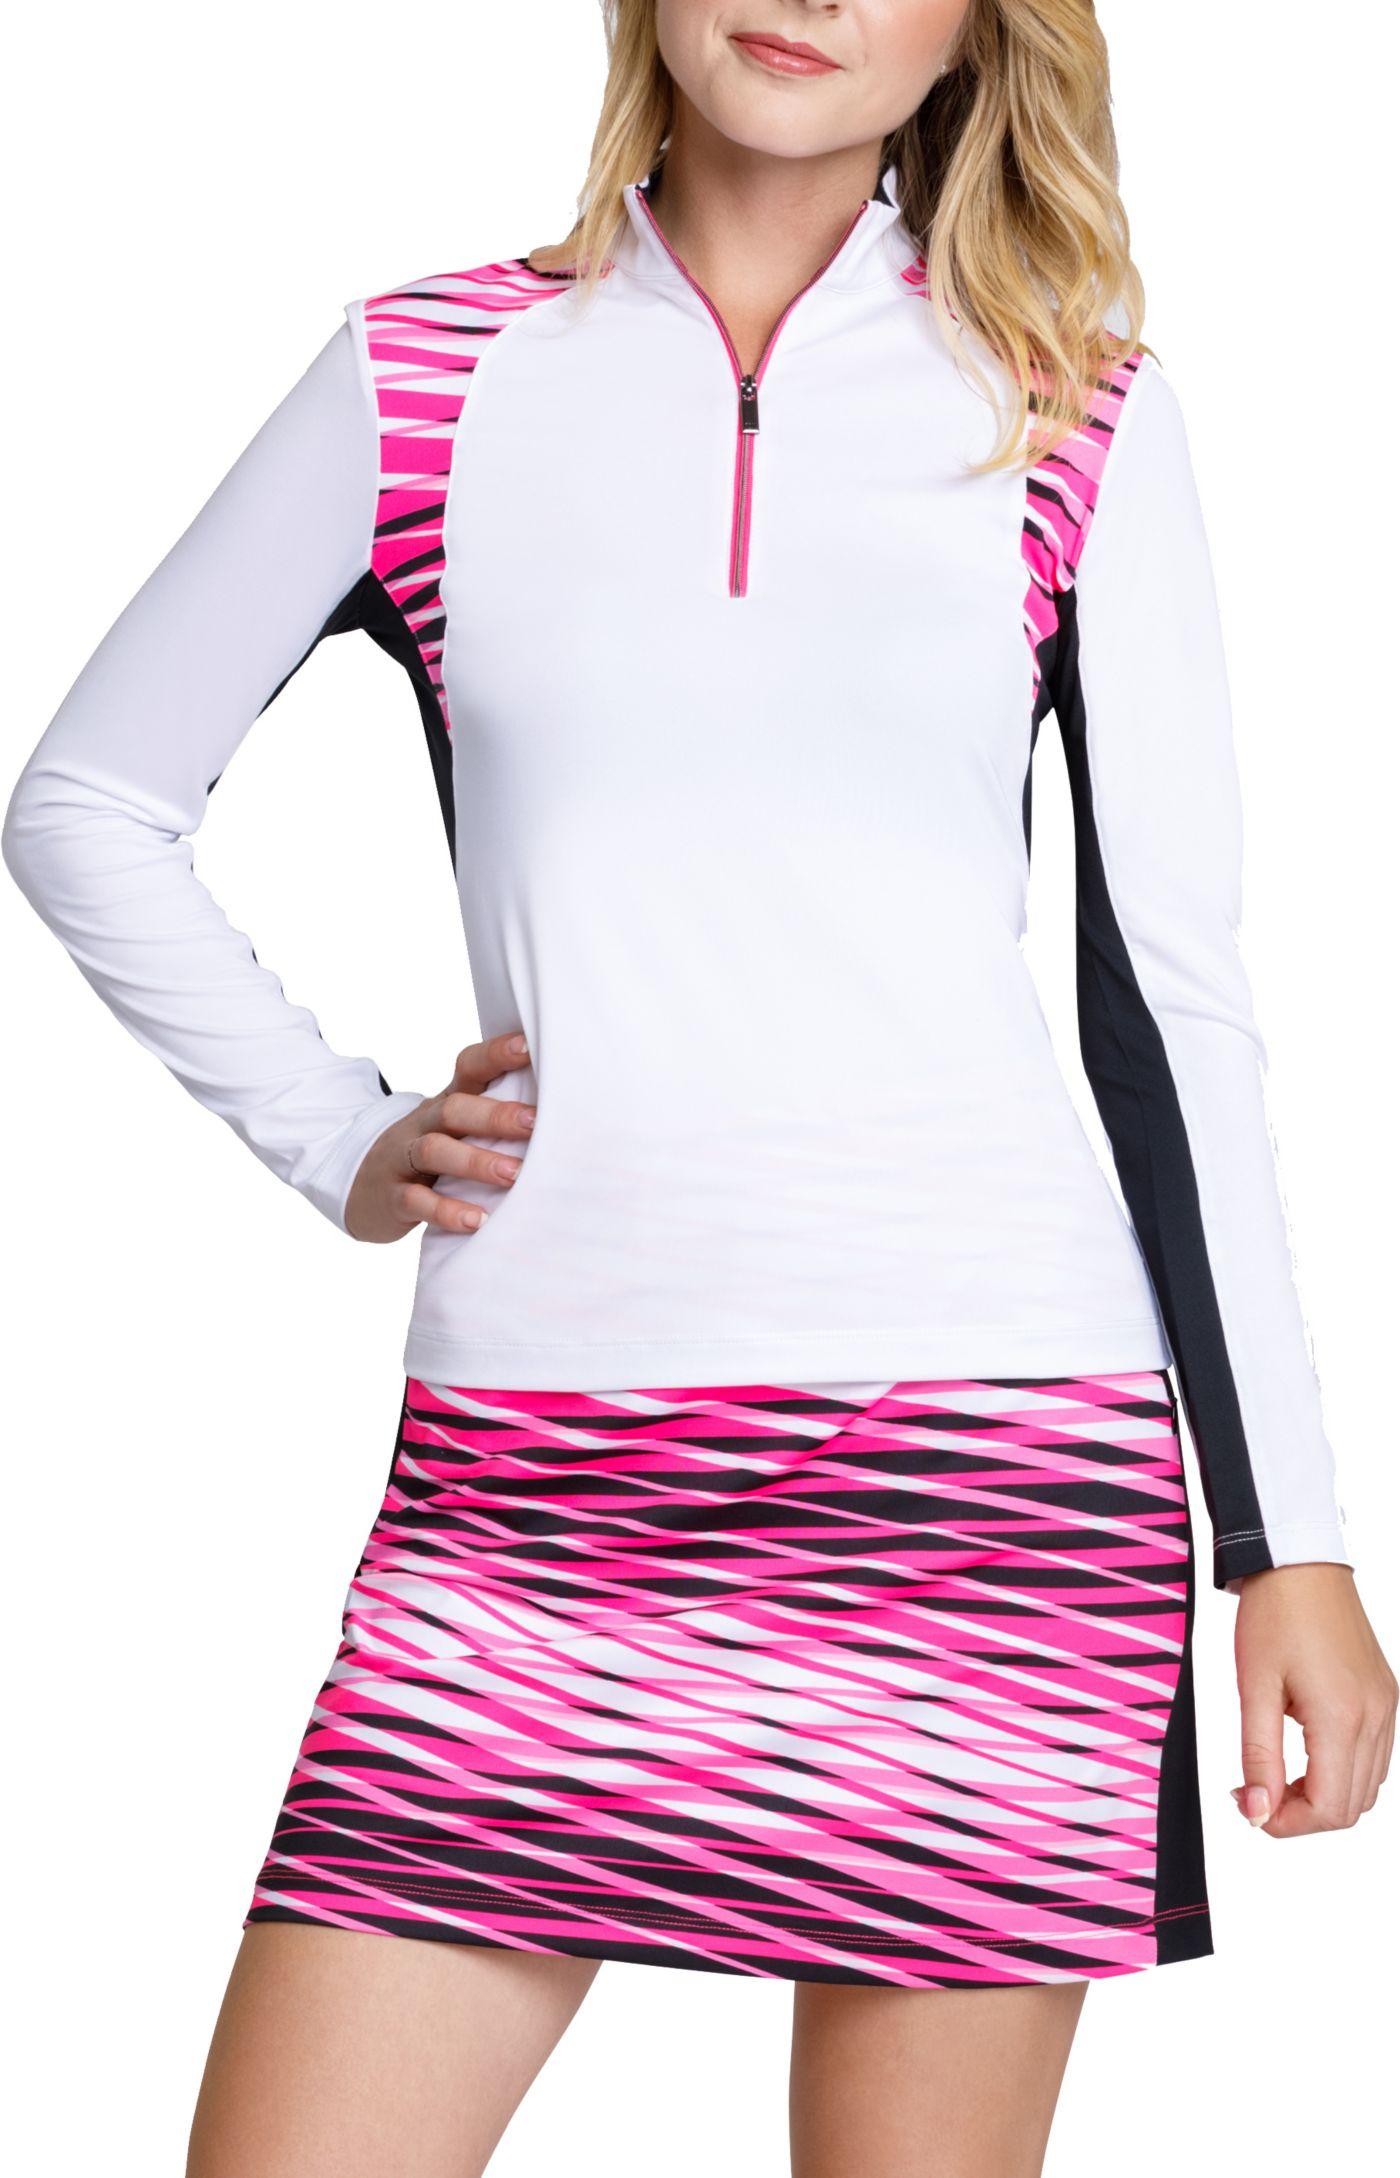 Tail Women's Long Sleeve Mock Neck Golf Top